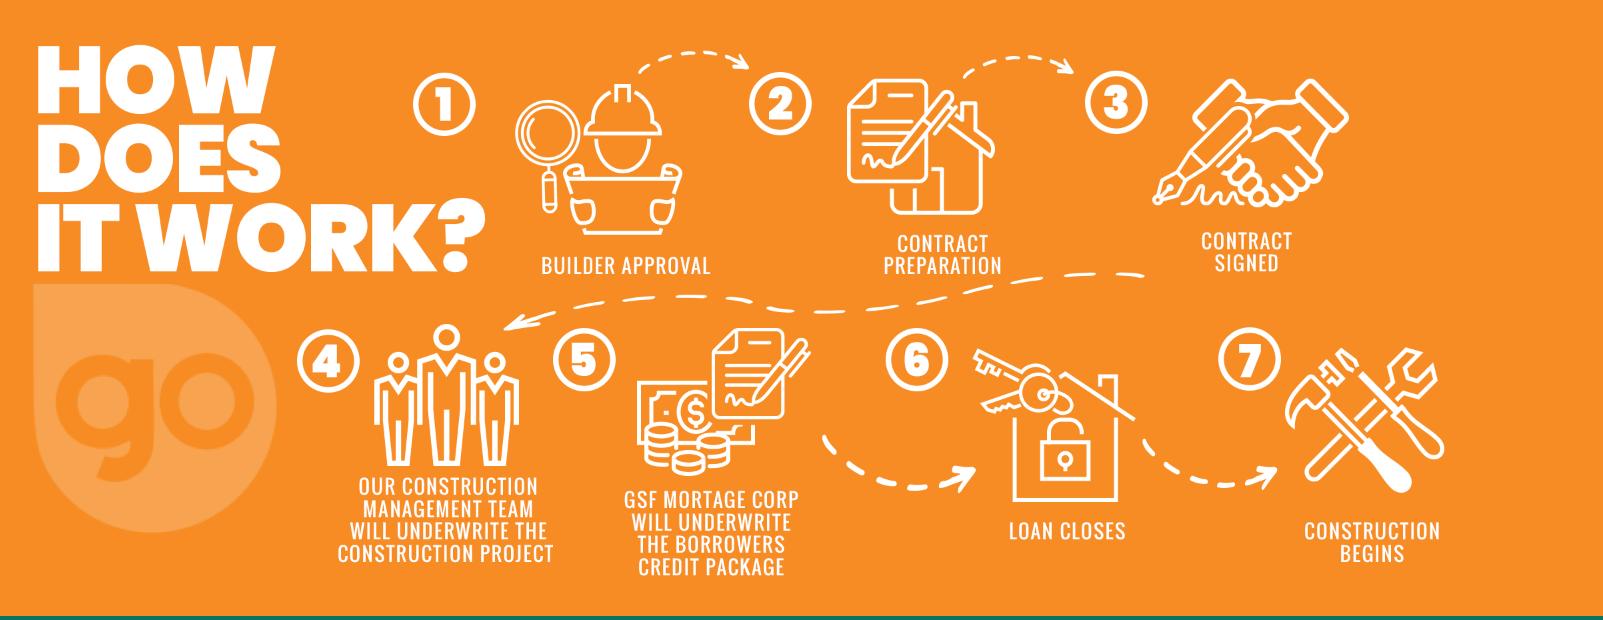 orange construction graphic